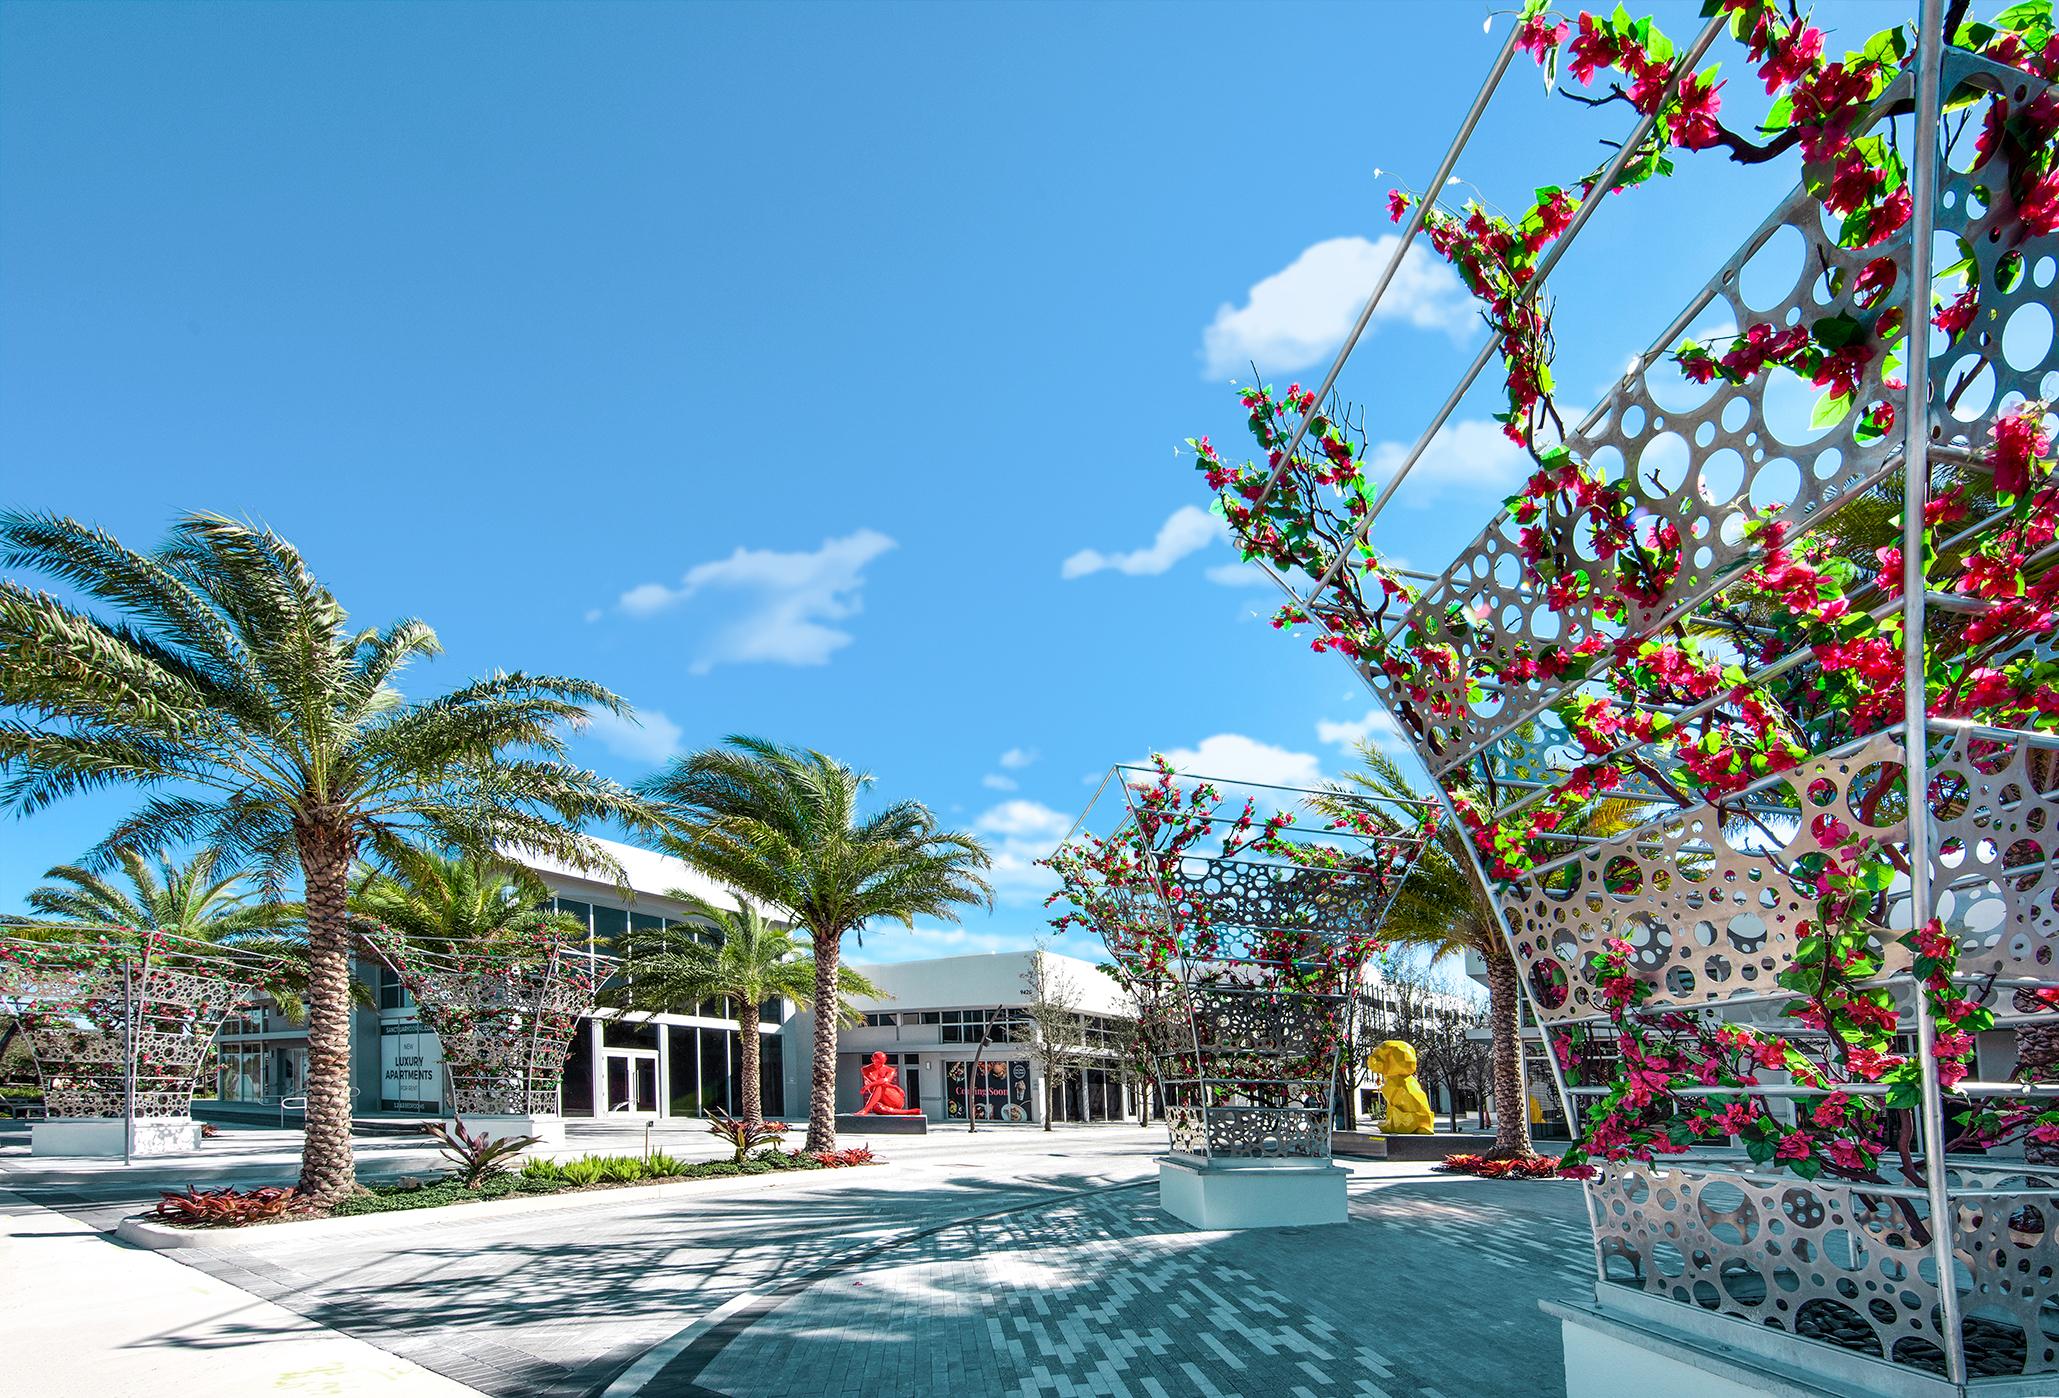 sanctuary entrance palms and blue sky